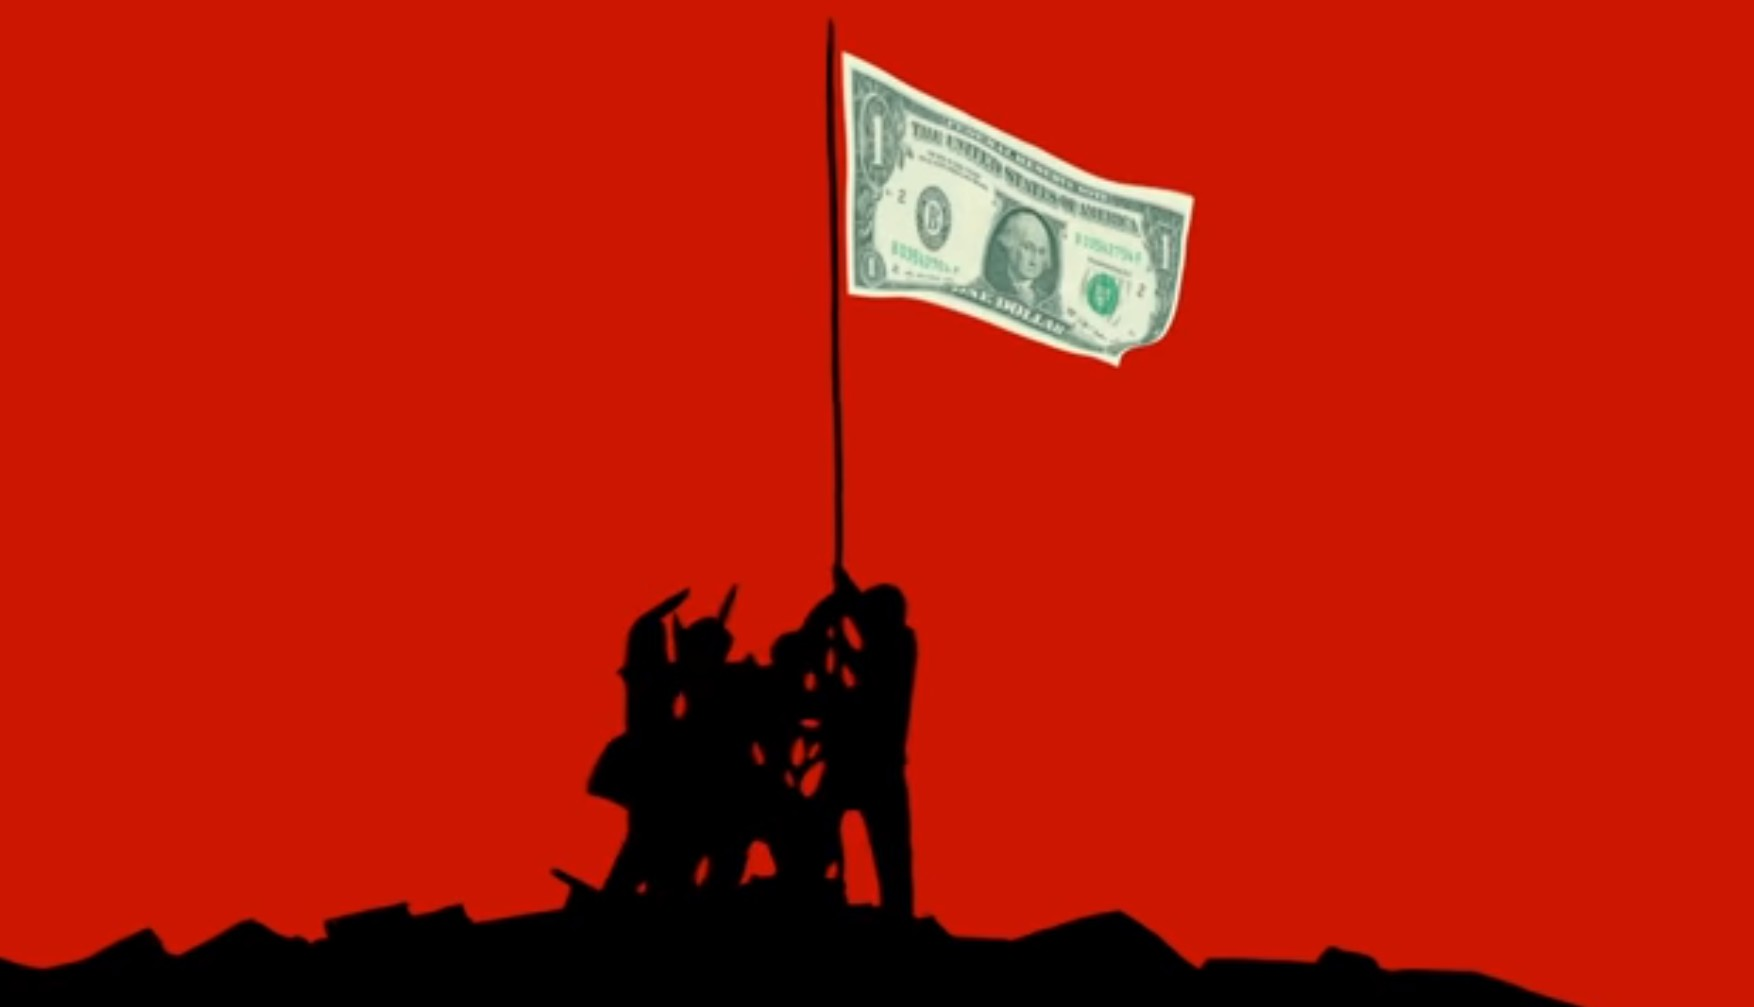 dio dollaro